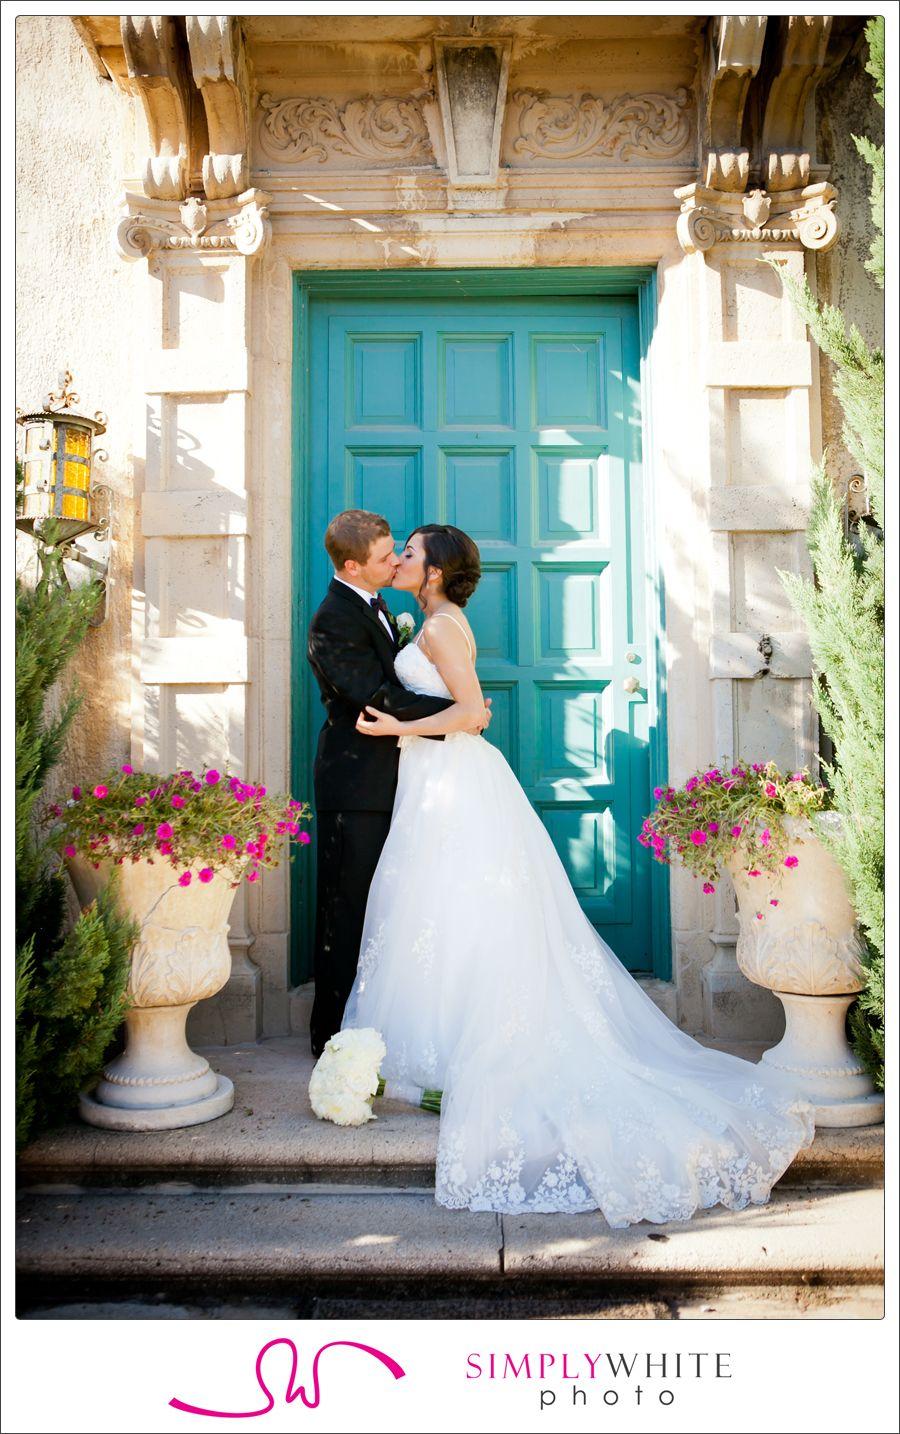 Laura + Ryan Dresser Mansion Teal blue weddings, Tulsa